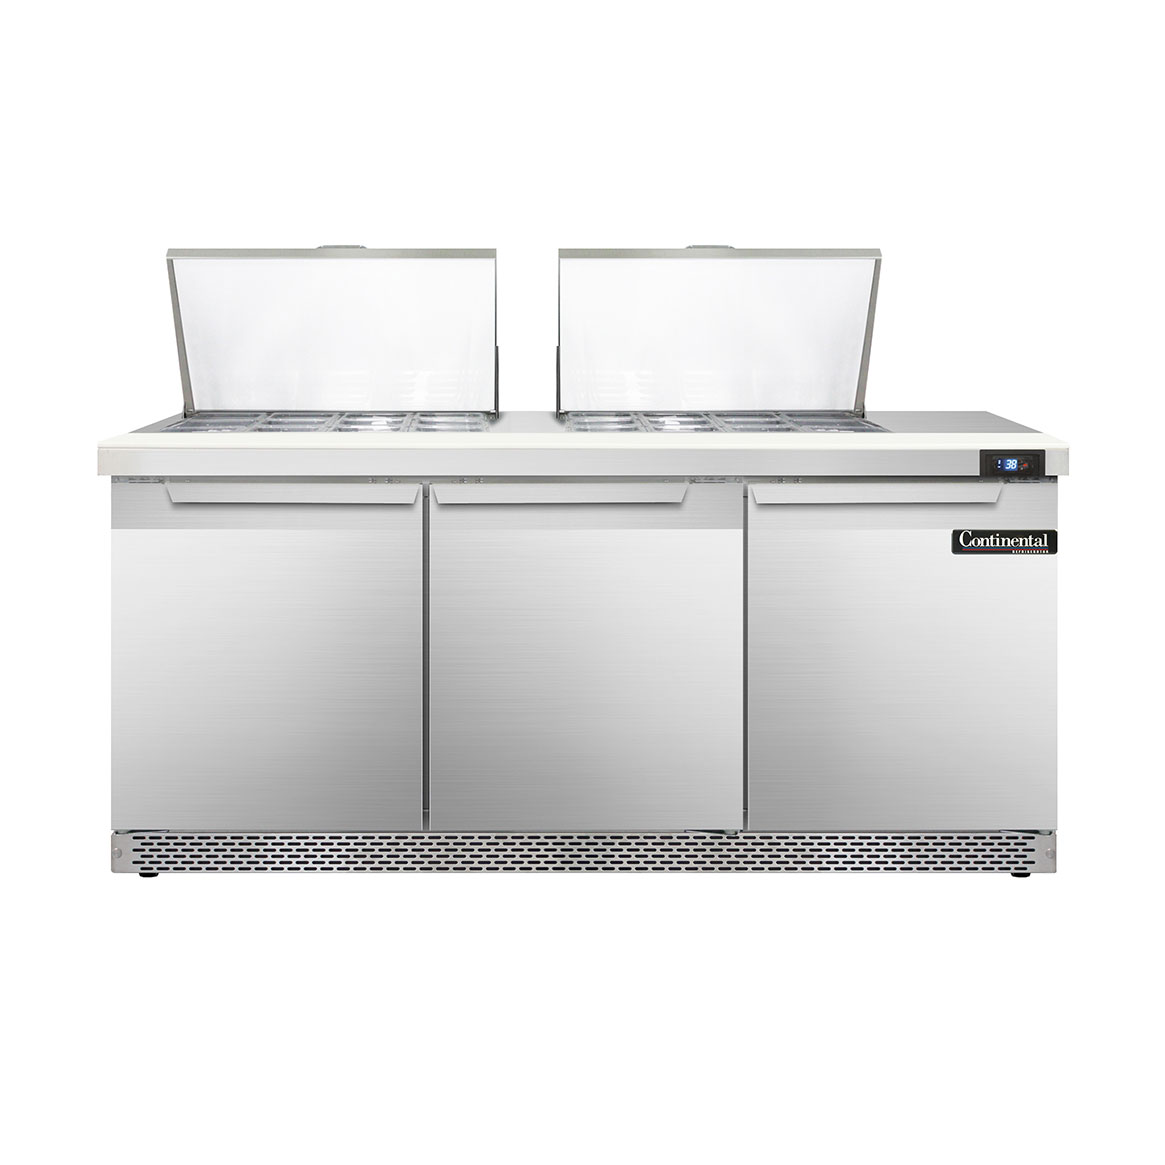 Continental Refrigerator DL72-24M-FB refrigerated counter, mega top sandwich / salad unit